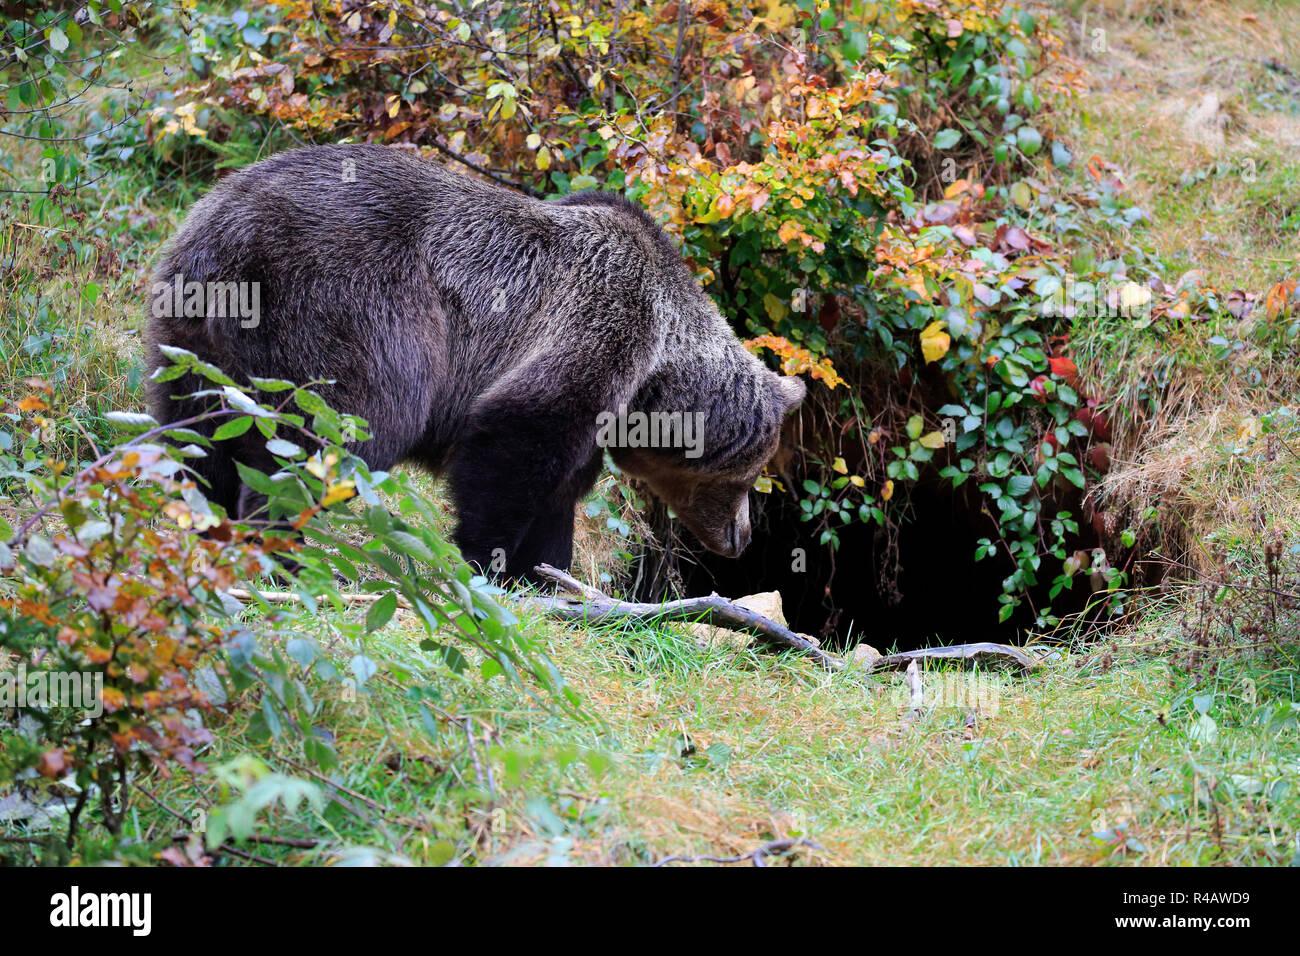 Eurasian brown bear, adult female at hibernation den in autumn, Bavarian Forest National Park, Germany, Europe, (Ursus arctos arctos) - Stock Image